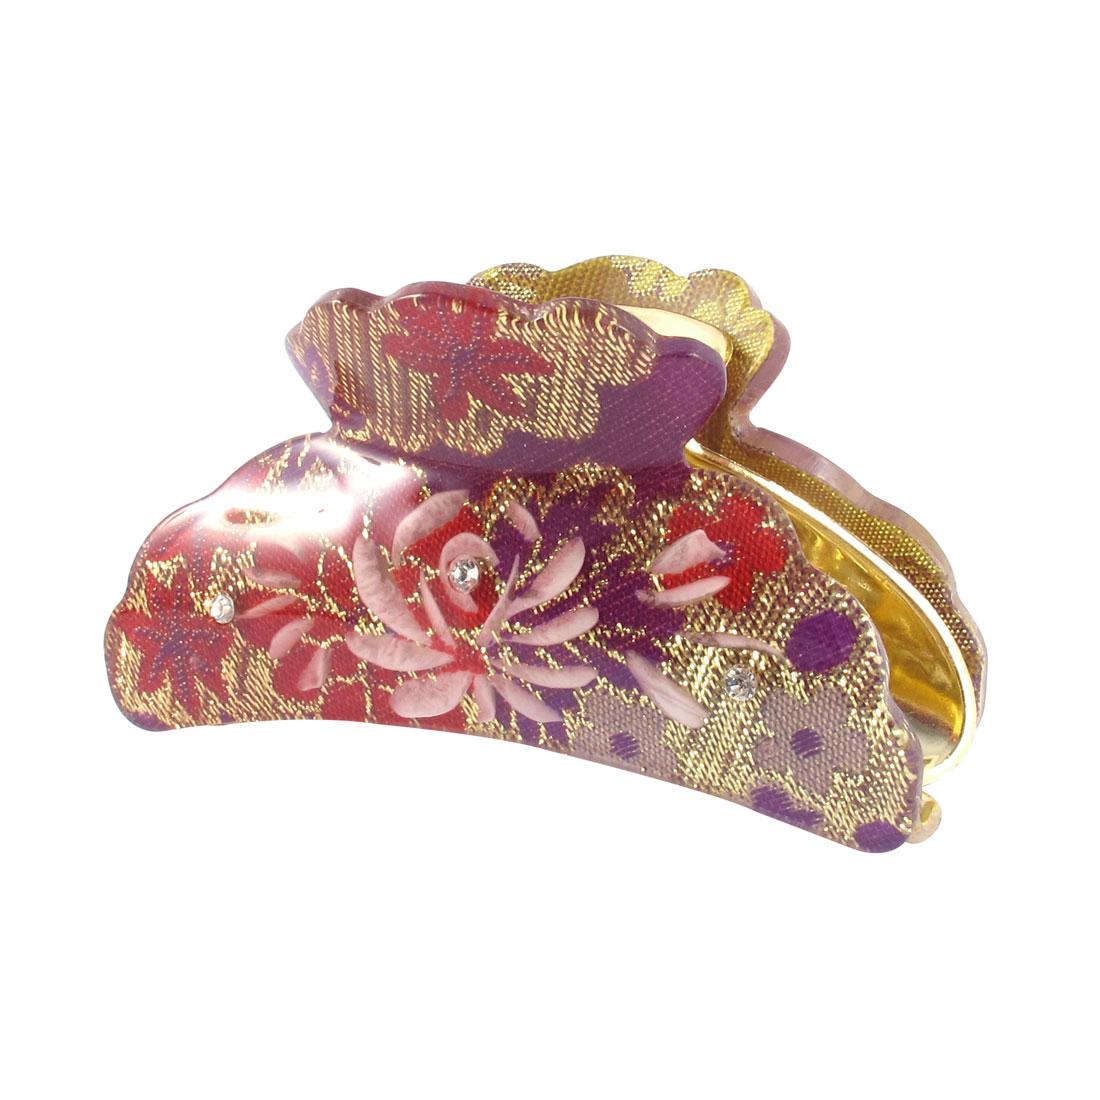 Woman Purple Hard Plastic Clamp Teeth Design Hair Clip Barrette Claw 3.5 Inch Length